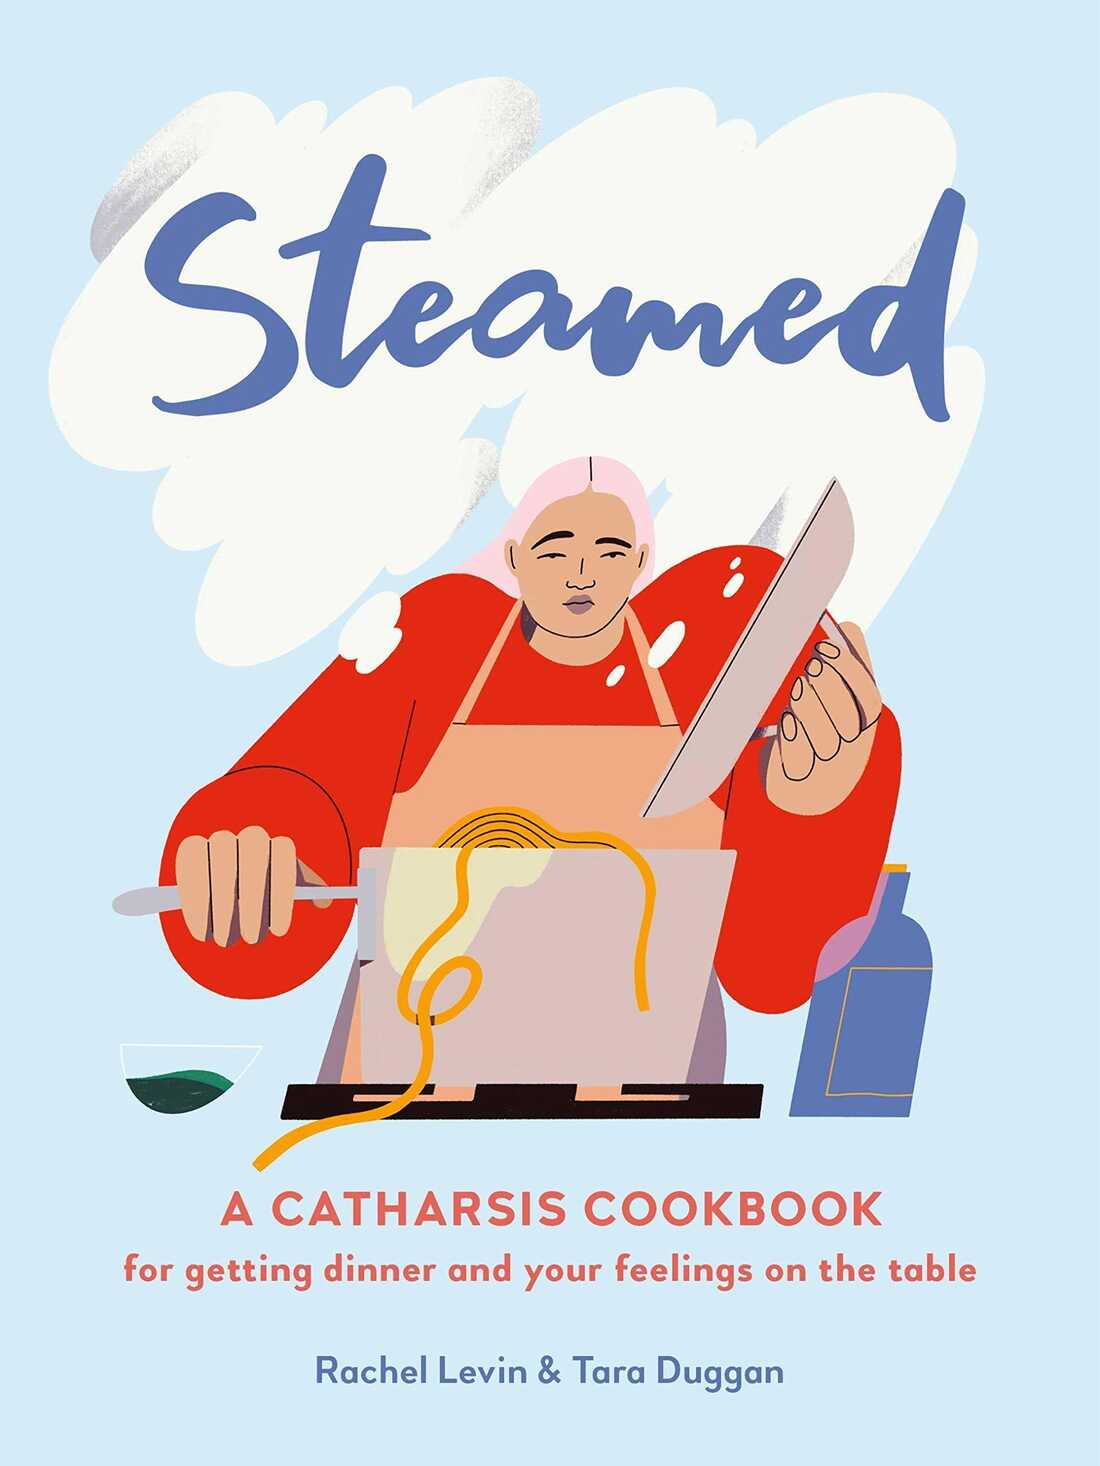 Steamed: A Catharsis Cookbook, by Rachel Levin and Tara Duggan.